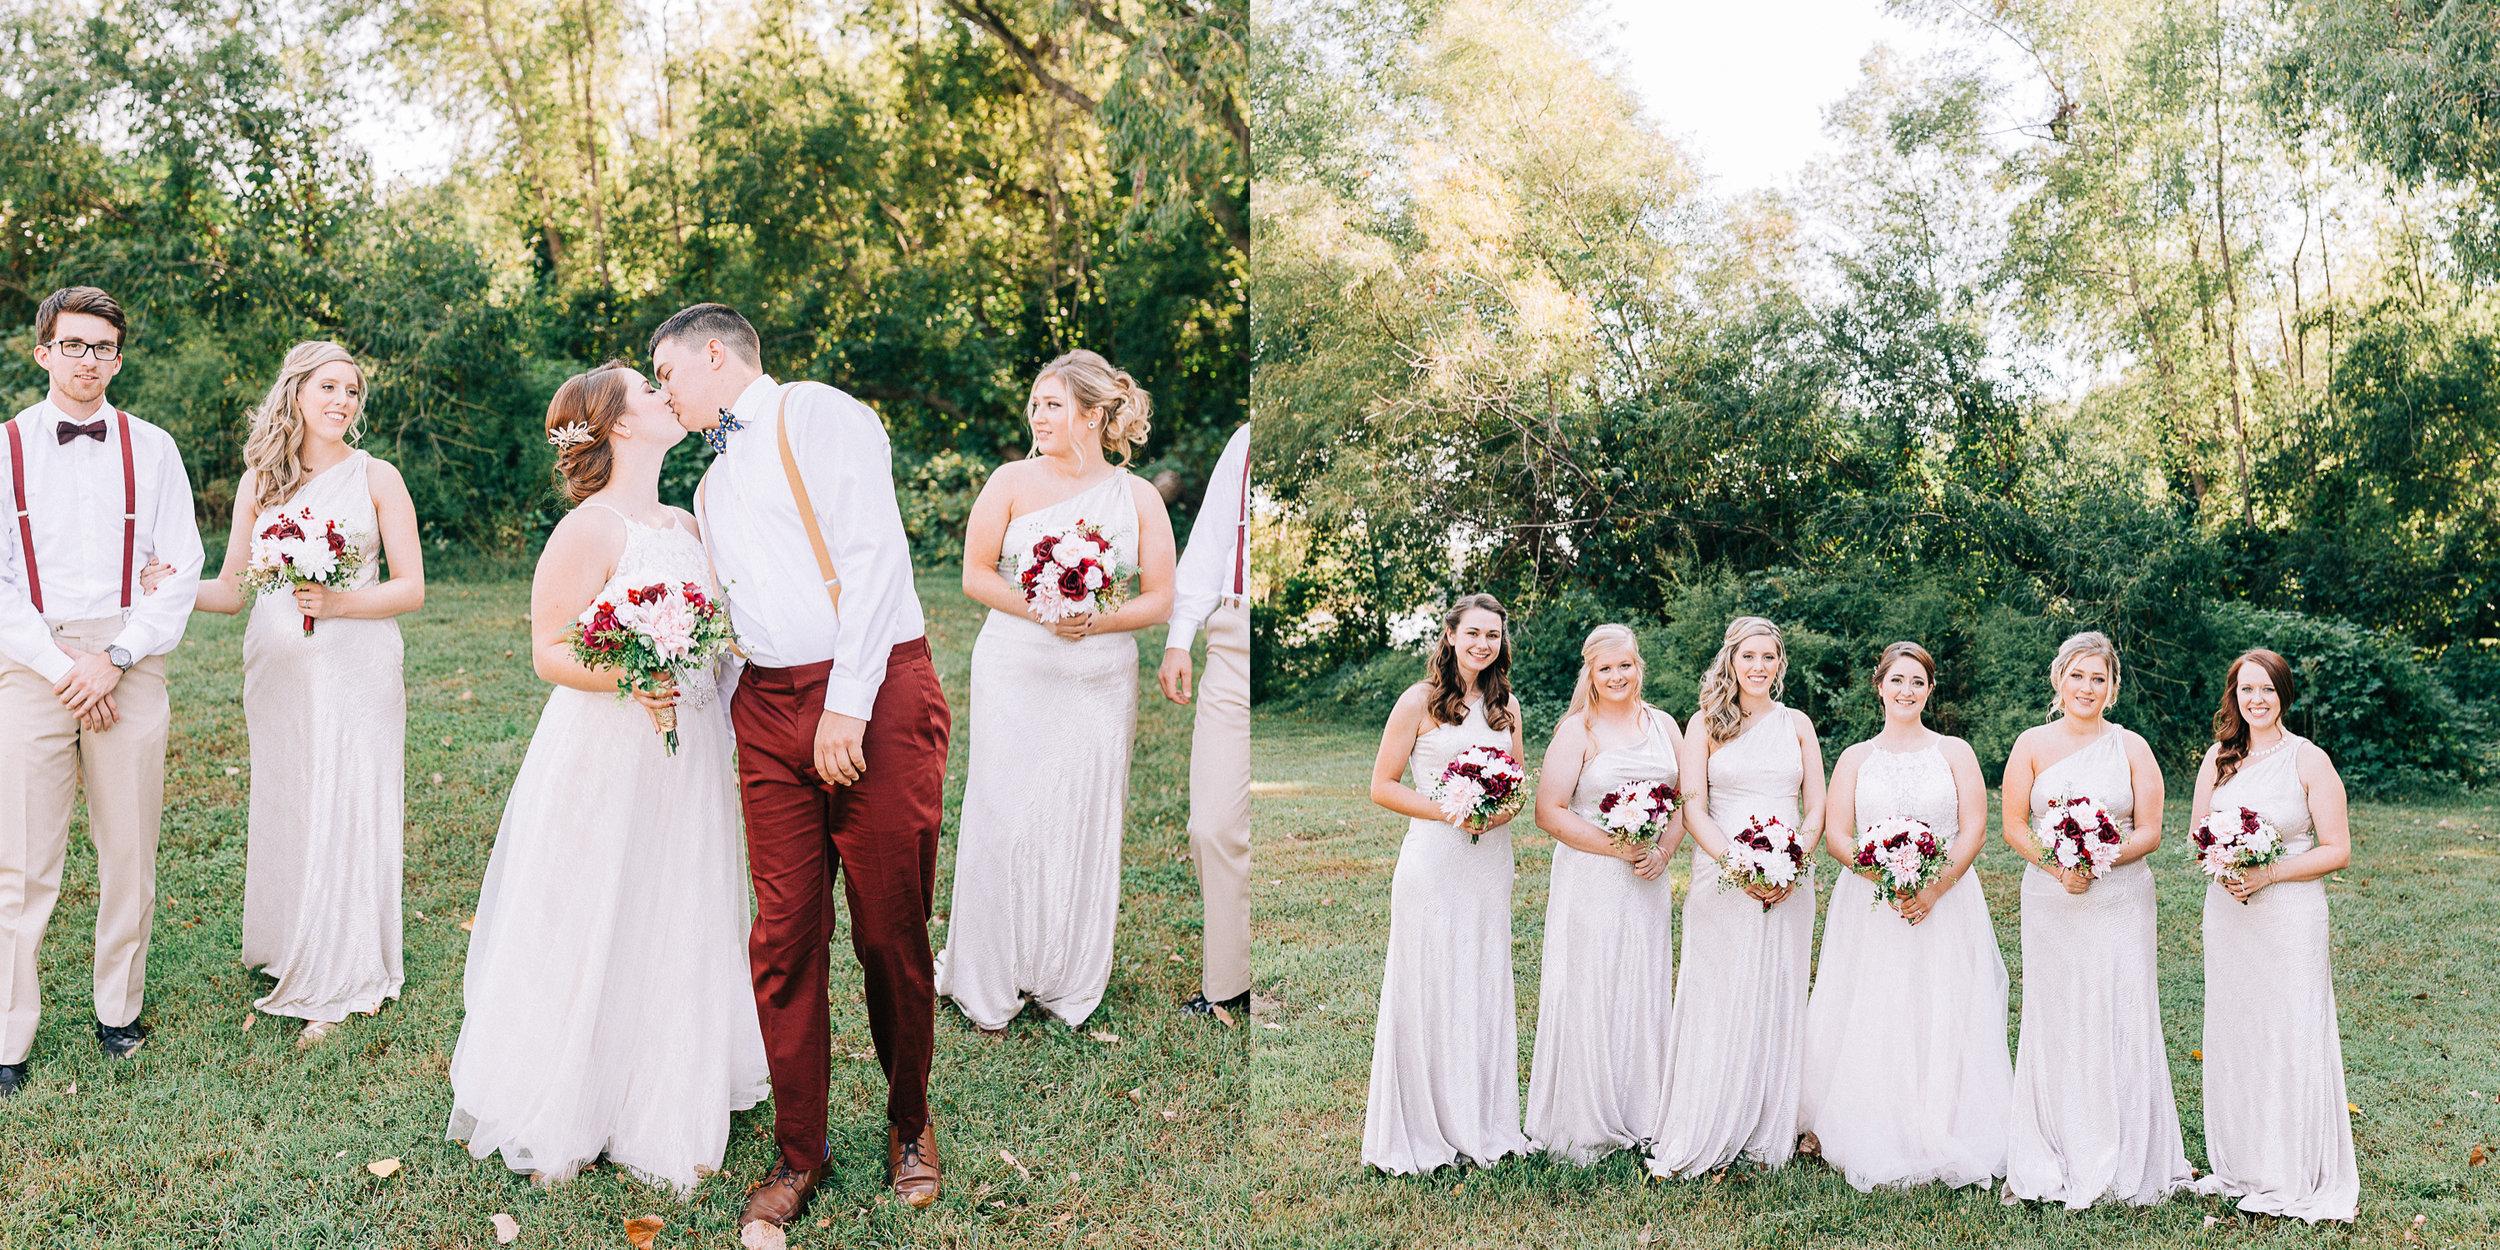 Dorothy_Louise_Photography_Eric_Fallon_La-Belle_Coeur_Main_Street_St_Charles_Wedding_Collage1.jpg